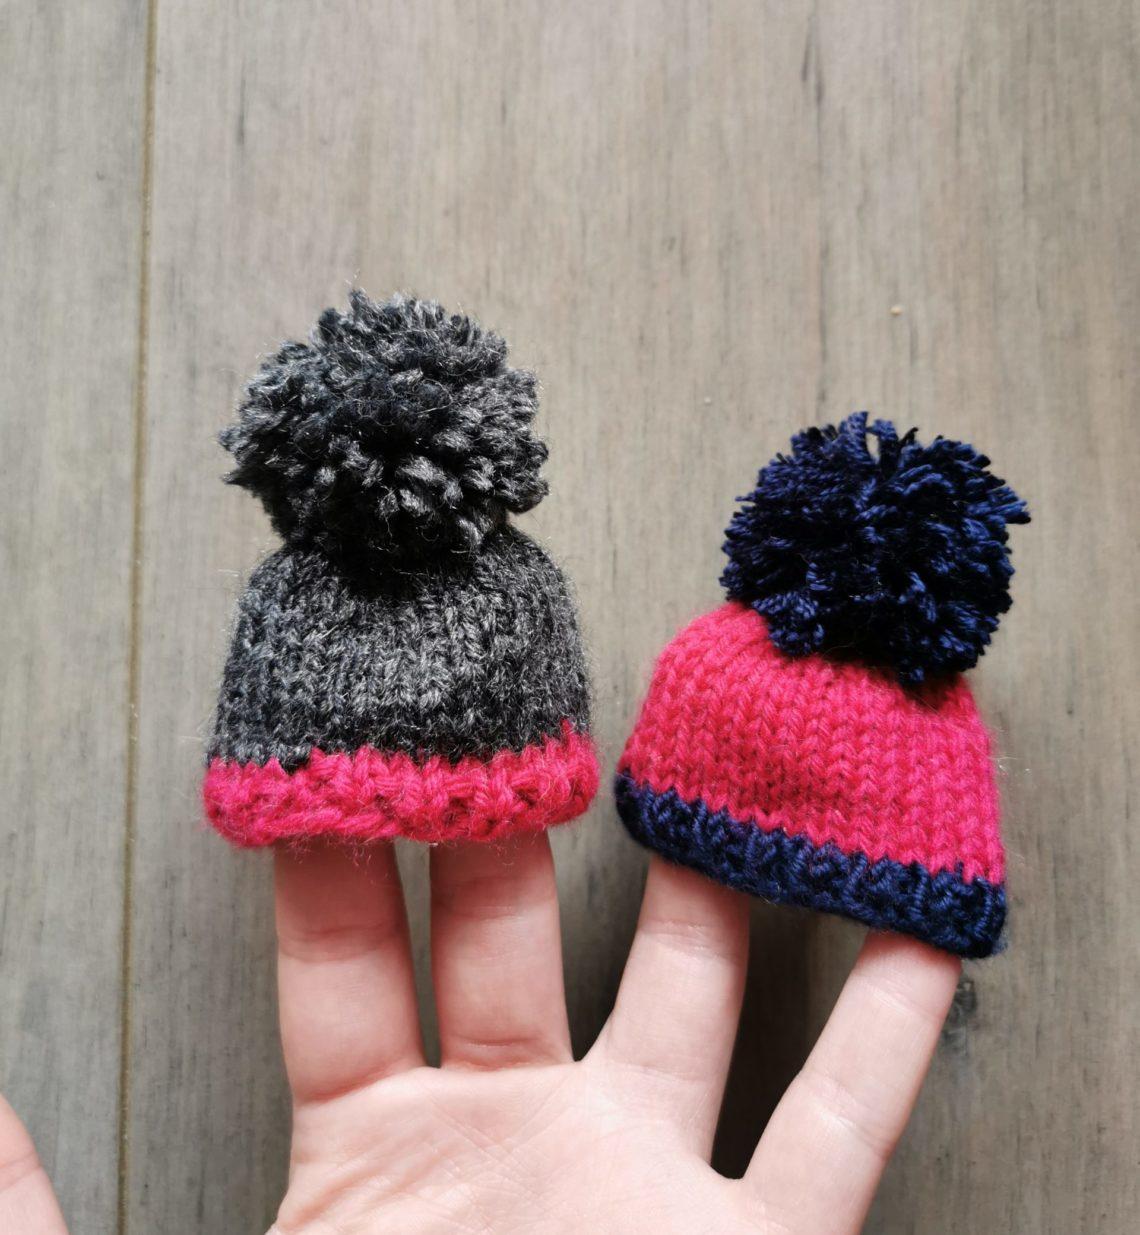 petits bonnets tricot